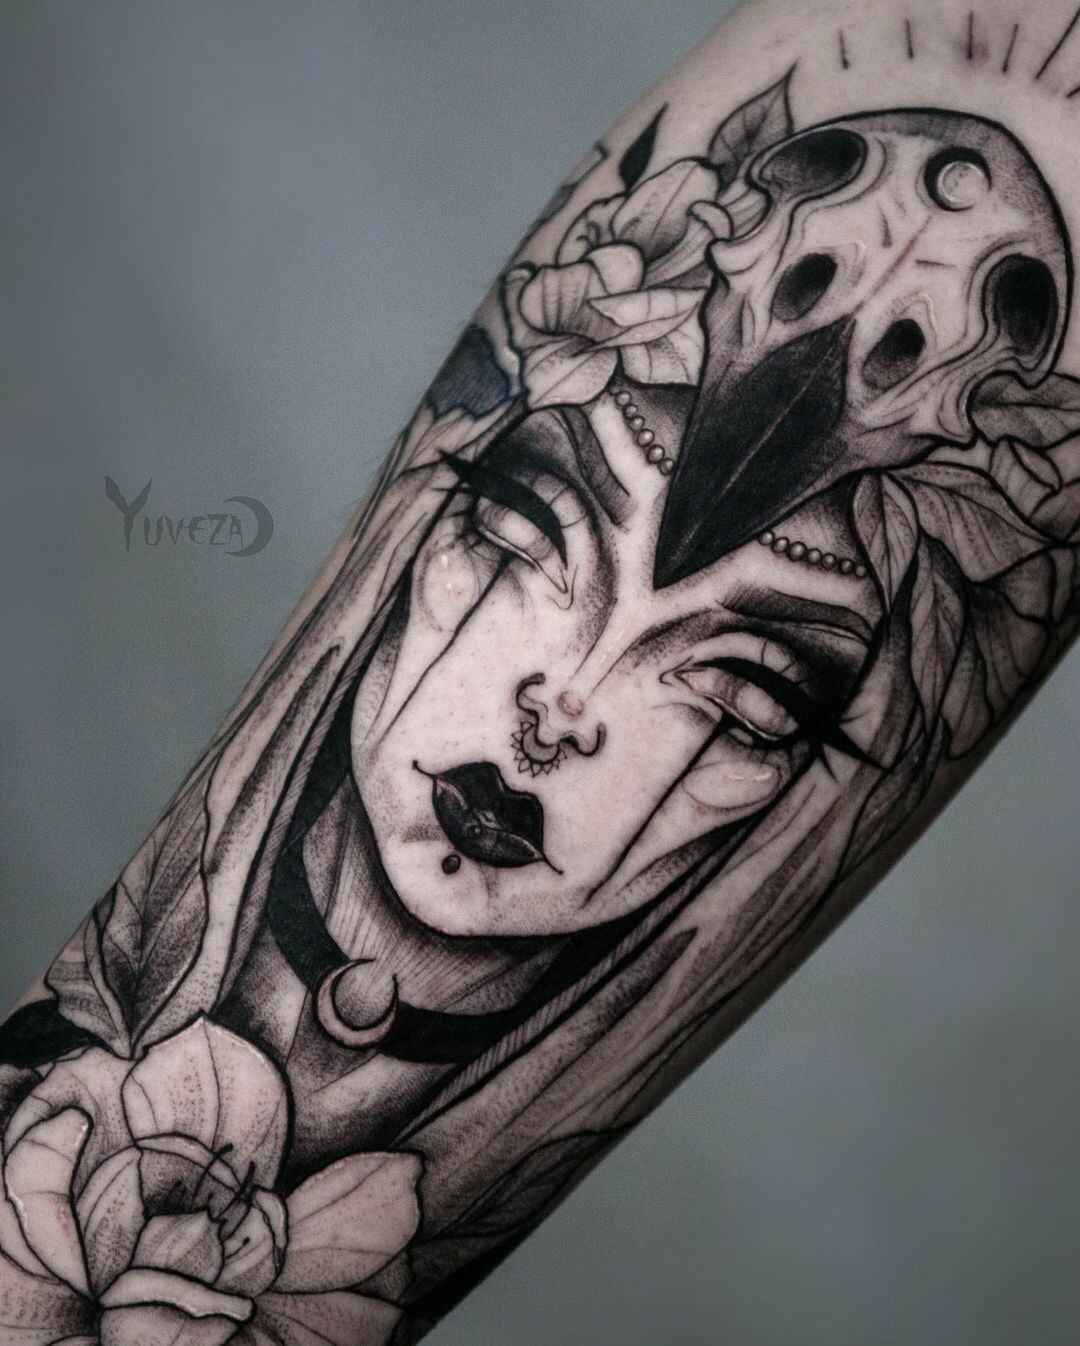 Inksearch tattoo Yuveza